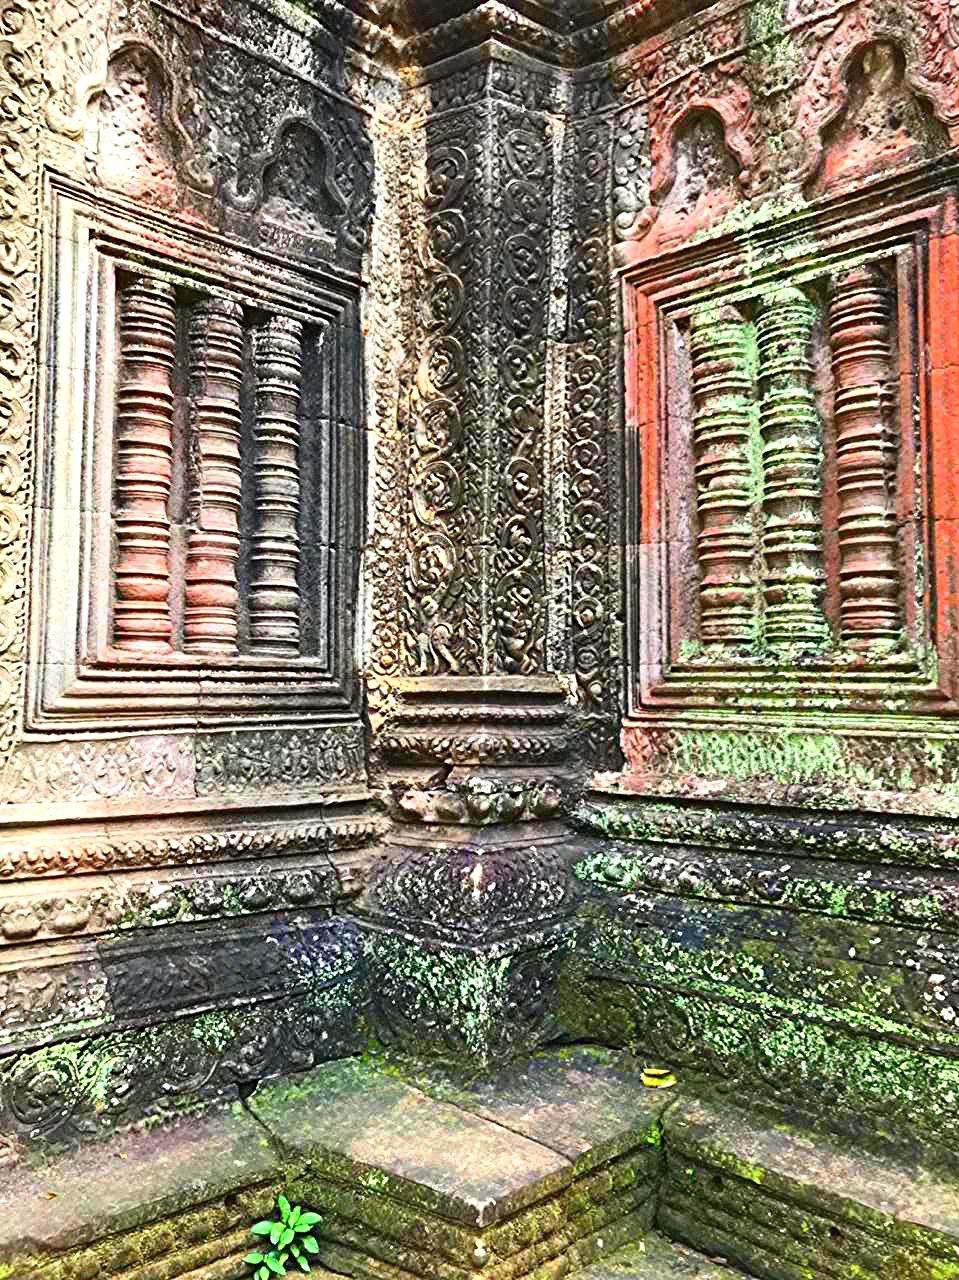 Елена Руденко (Валтея). Камбоджа. Ангкор. - Страница 2 KsgT3GprUtc